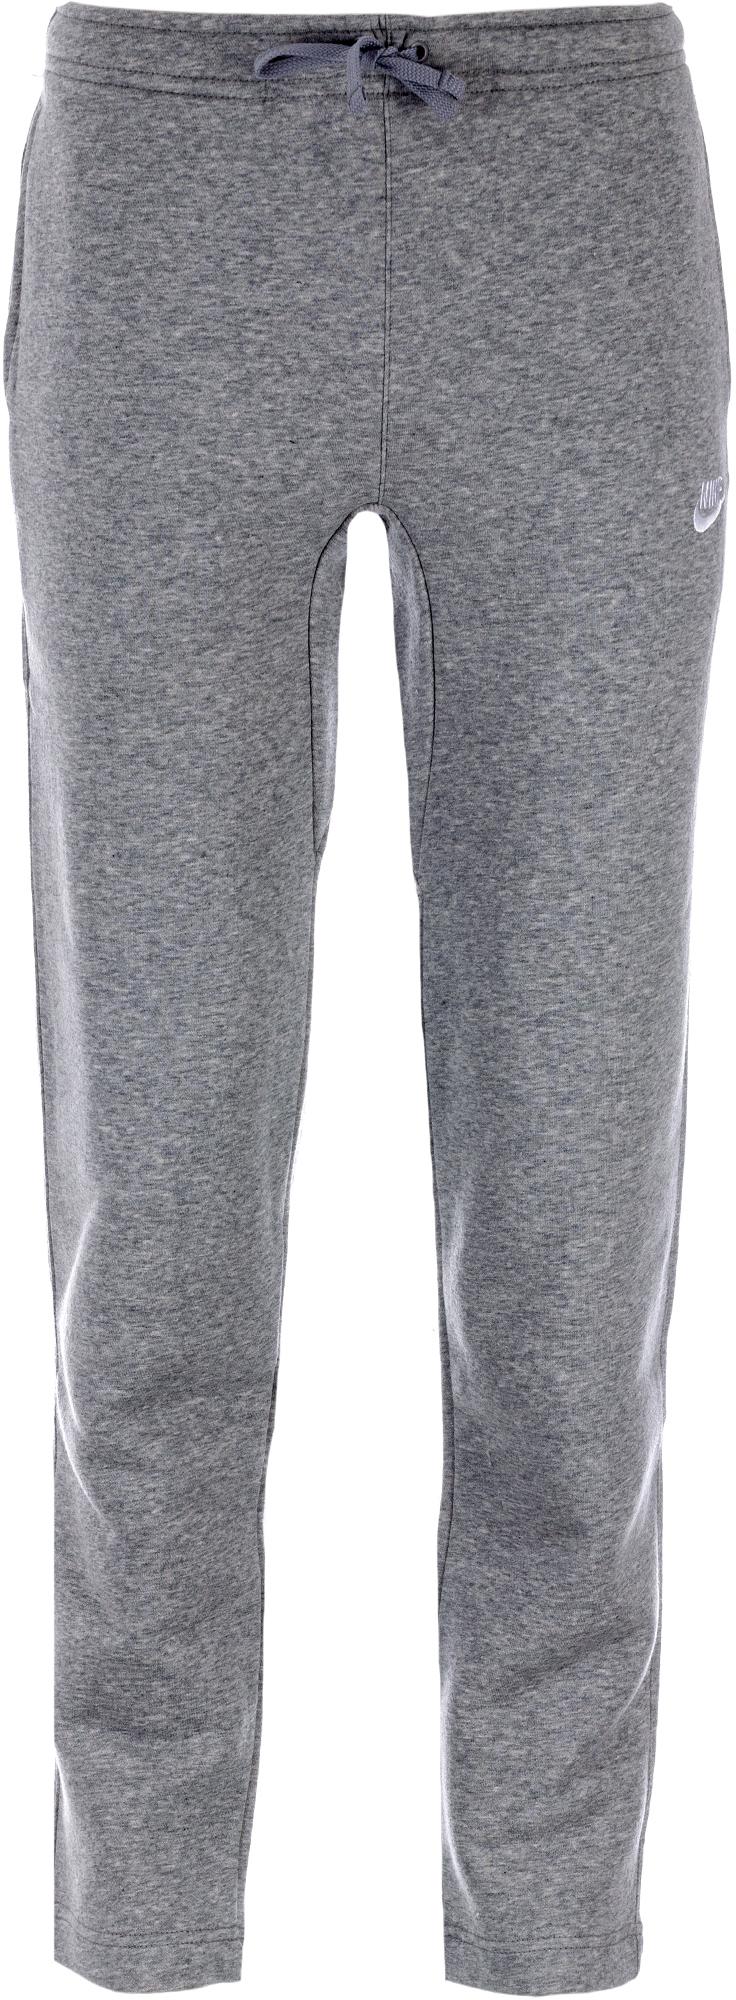 Nike Брюки мужские Nike Sportswear